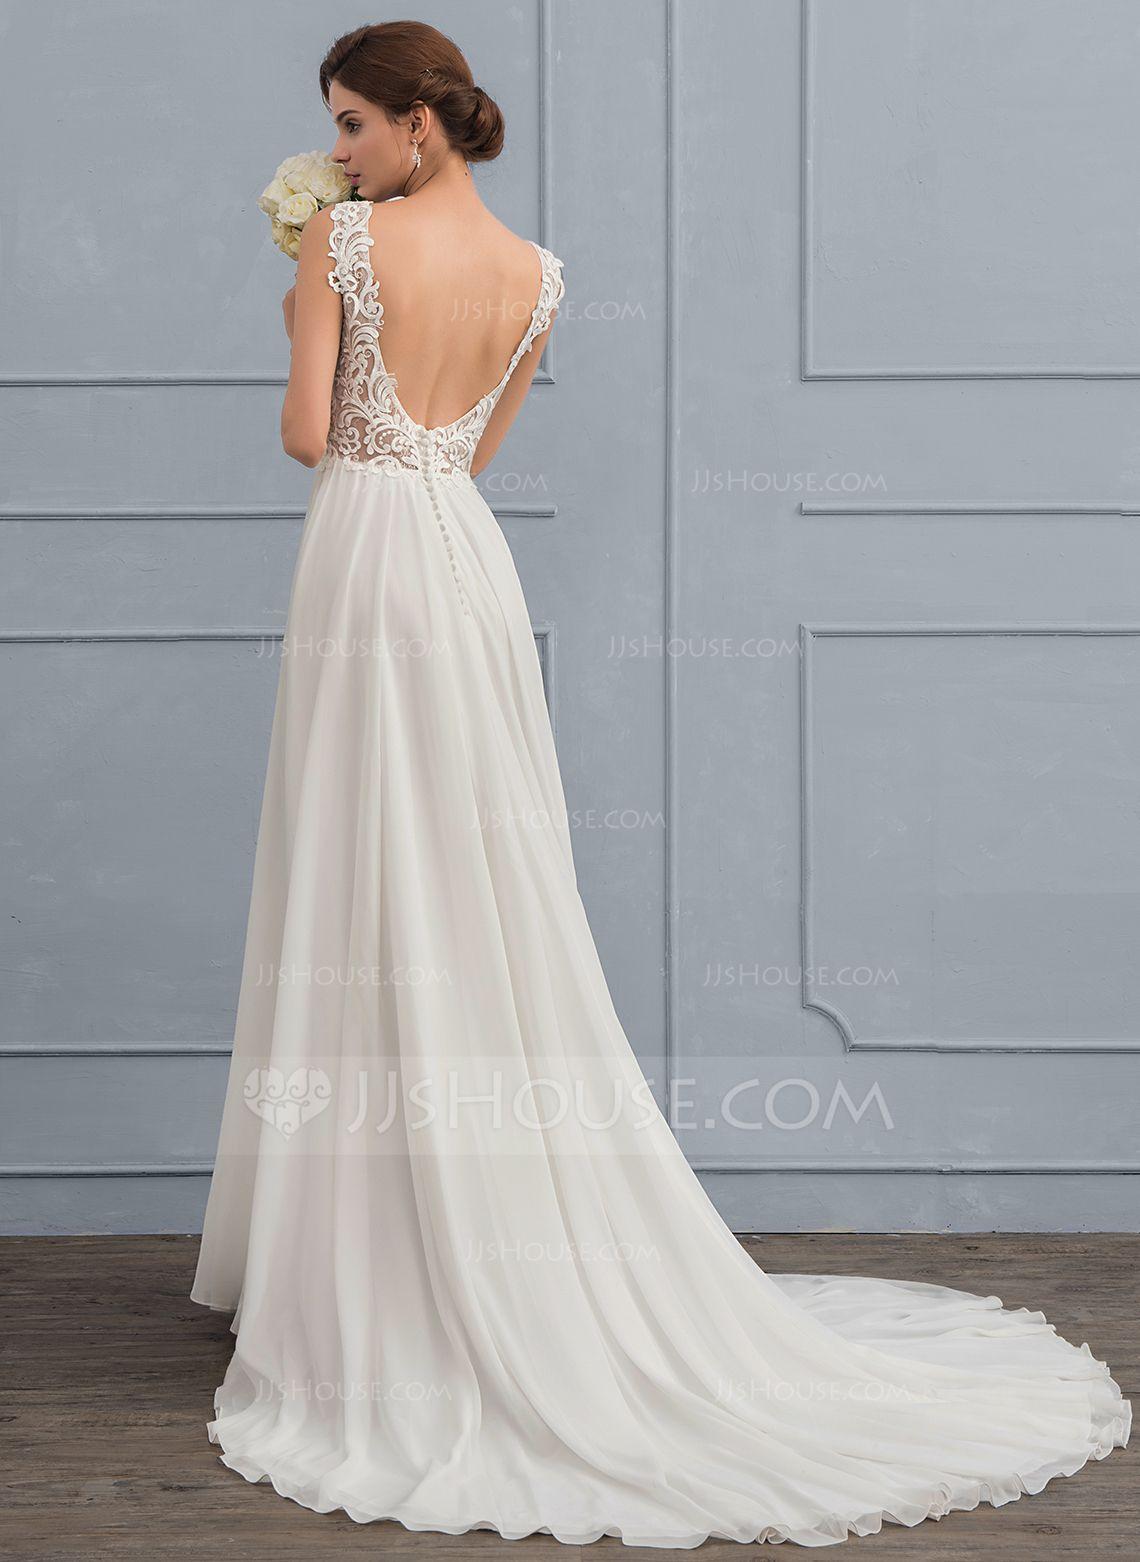 Au 352 00 A Line V Neck Court Train Chiffon Wedding Dress Jj S House Chiffon Wedding Dress Wedding Dresses Online Wedding Dress